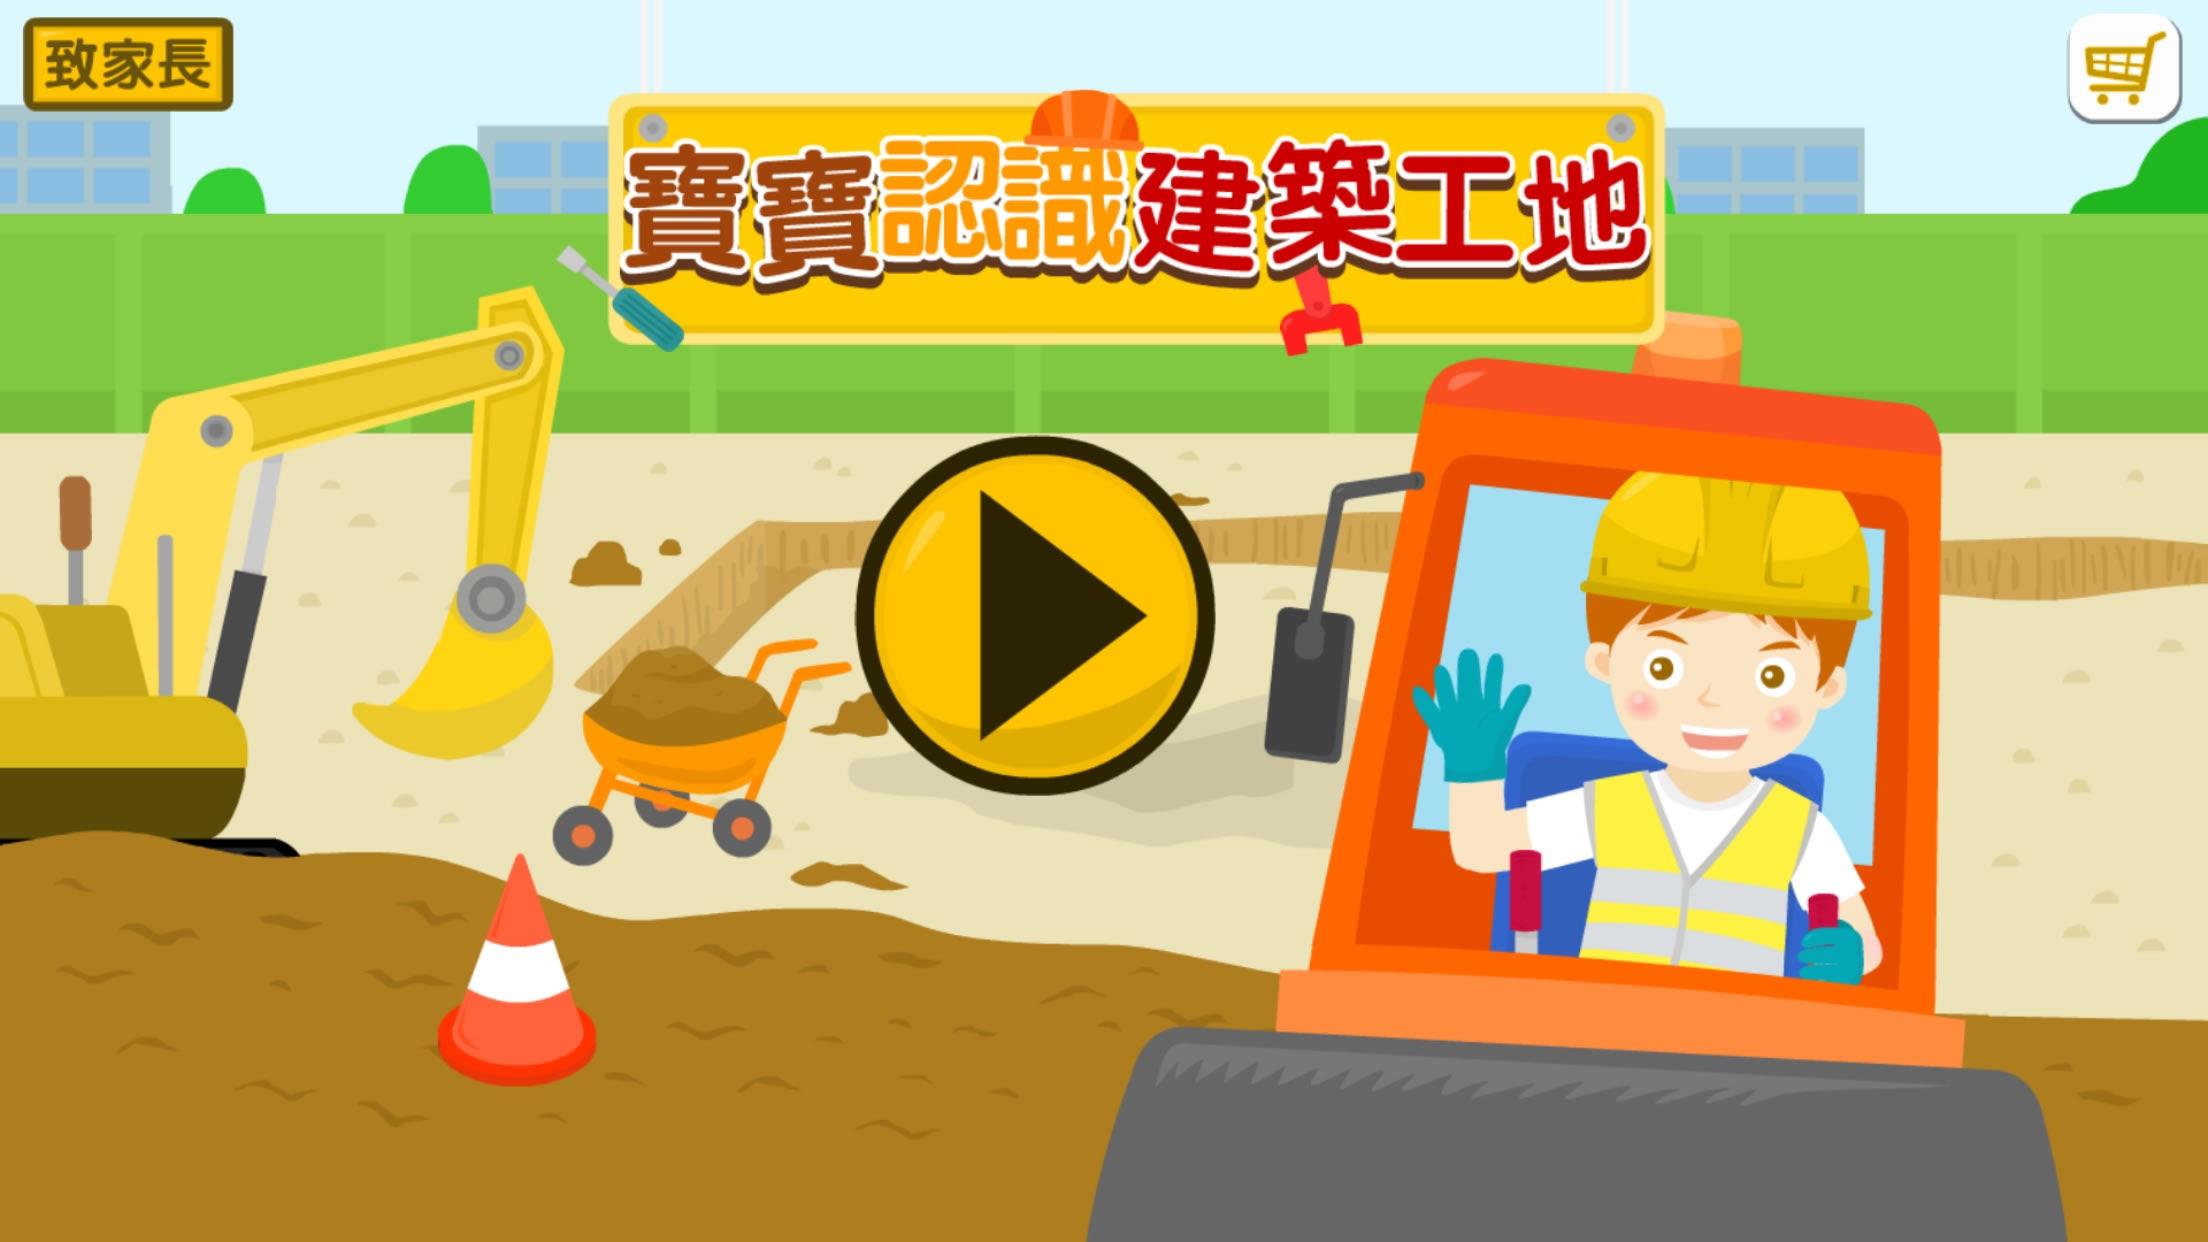 Trucks for children kids - Construction games-宝宝认识建筑工地:卡车,挖掘机儿童拼图游戏